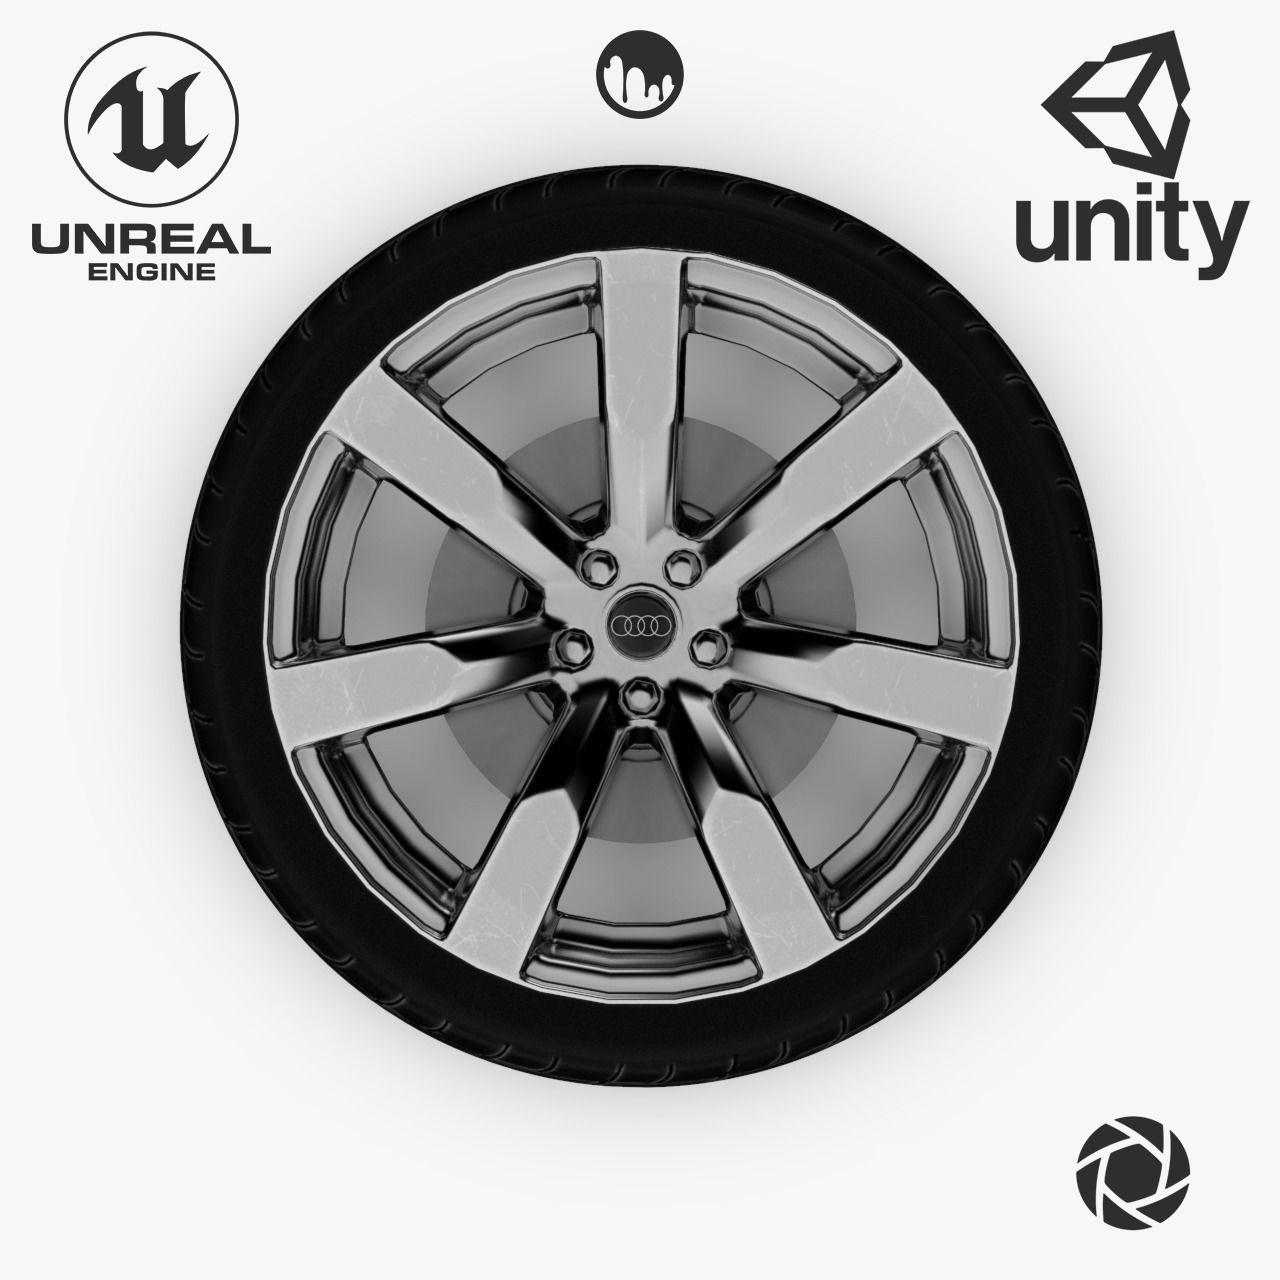 Wheel Steel-Chrome Alloy Rim Audi 19 inch Yokohama based Tire